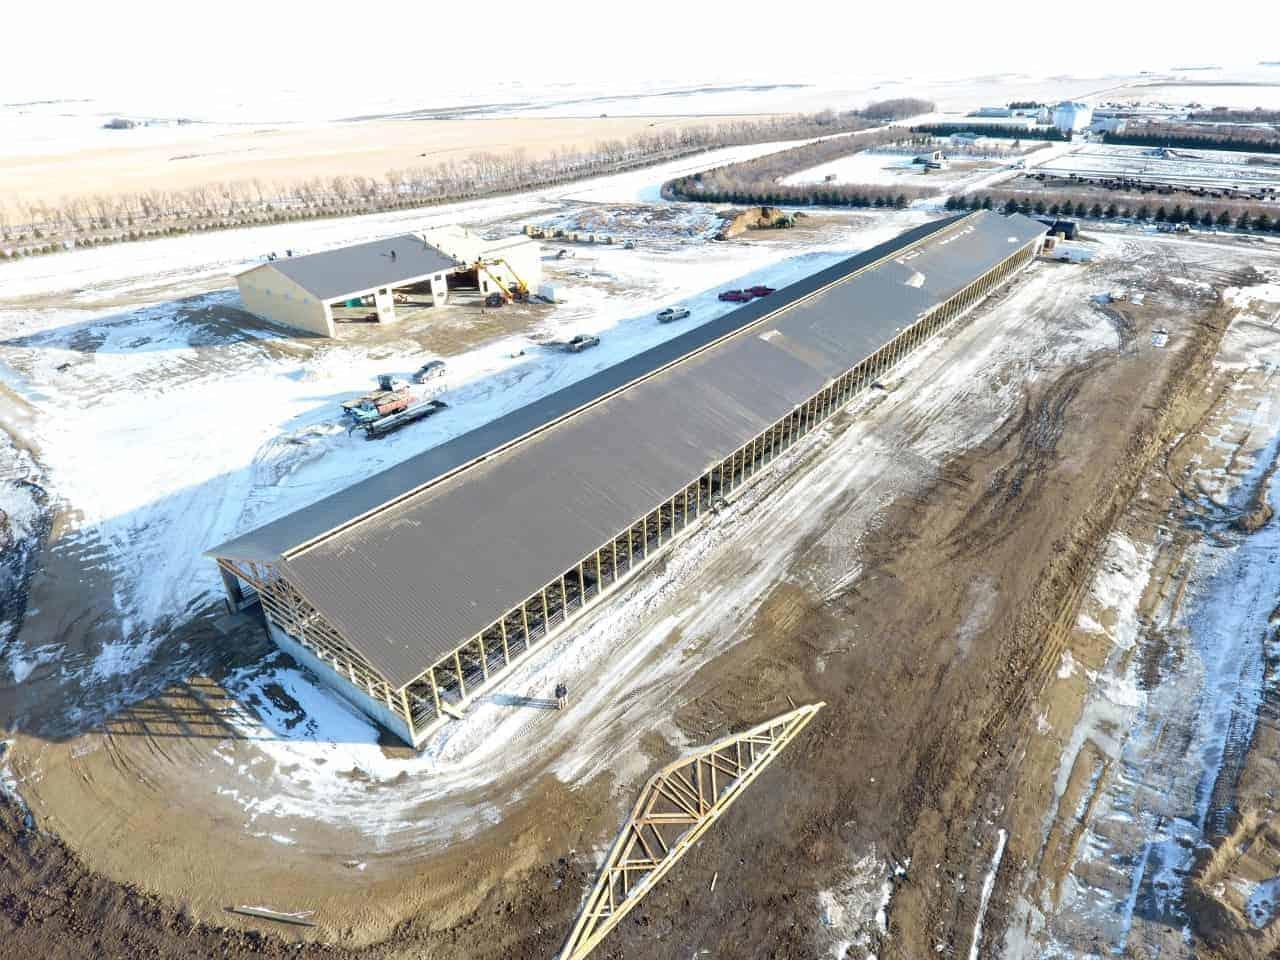 J&P Livestock Manure Storage System by Wieser Concrete